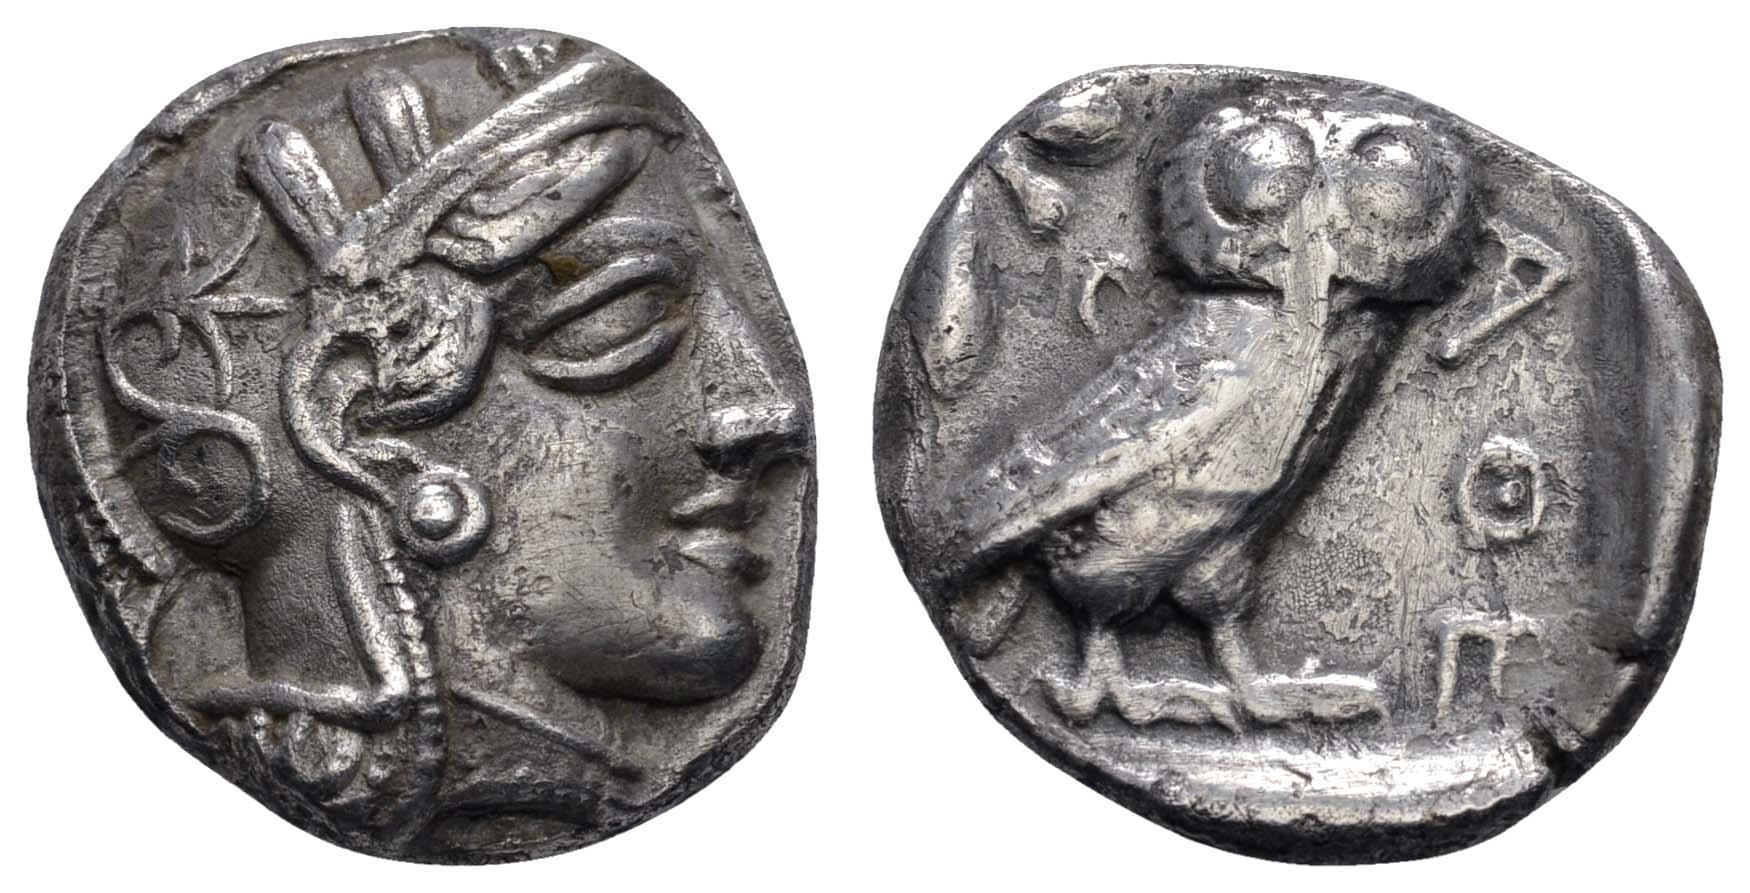 Lot 35 - Antike Griechen - Attika -  Auktionshaus Ulrich Felzmann GmbH & Co. KG Coins single lots